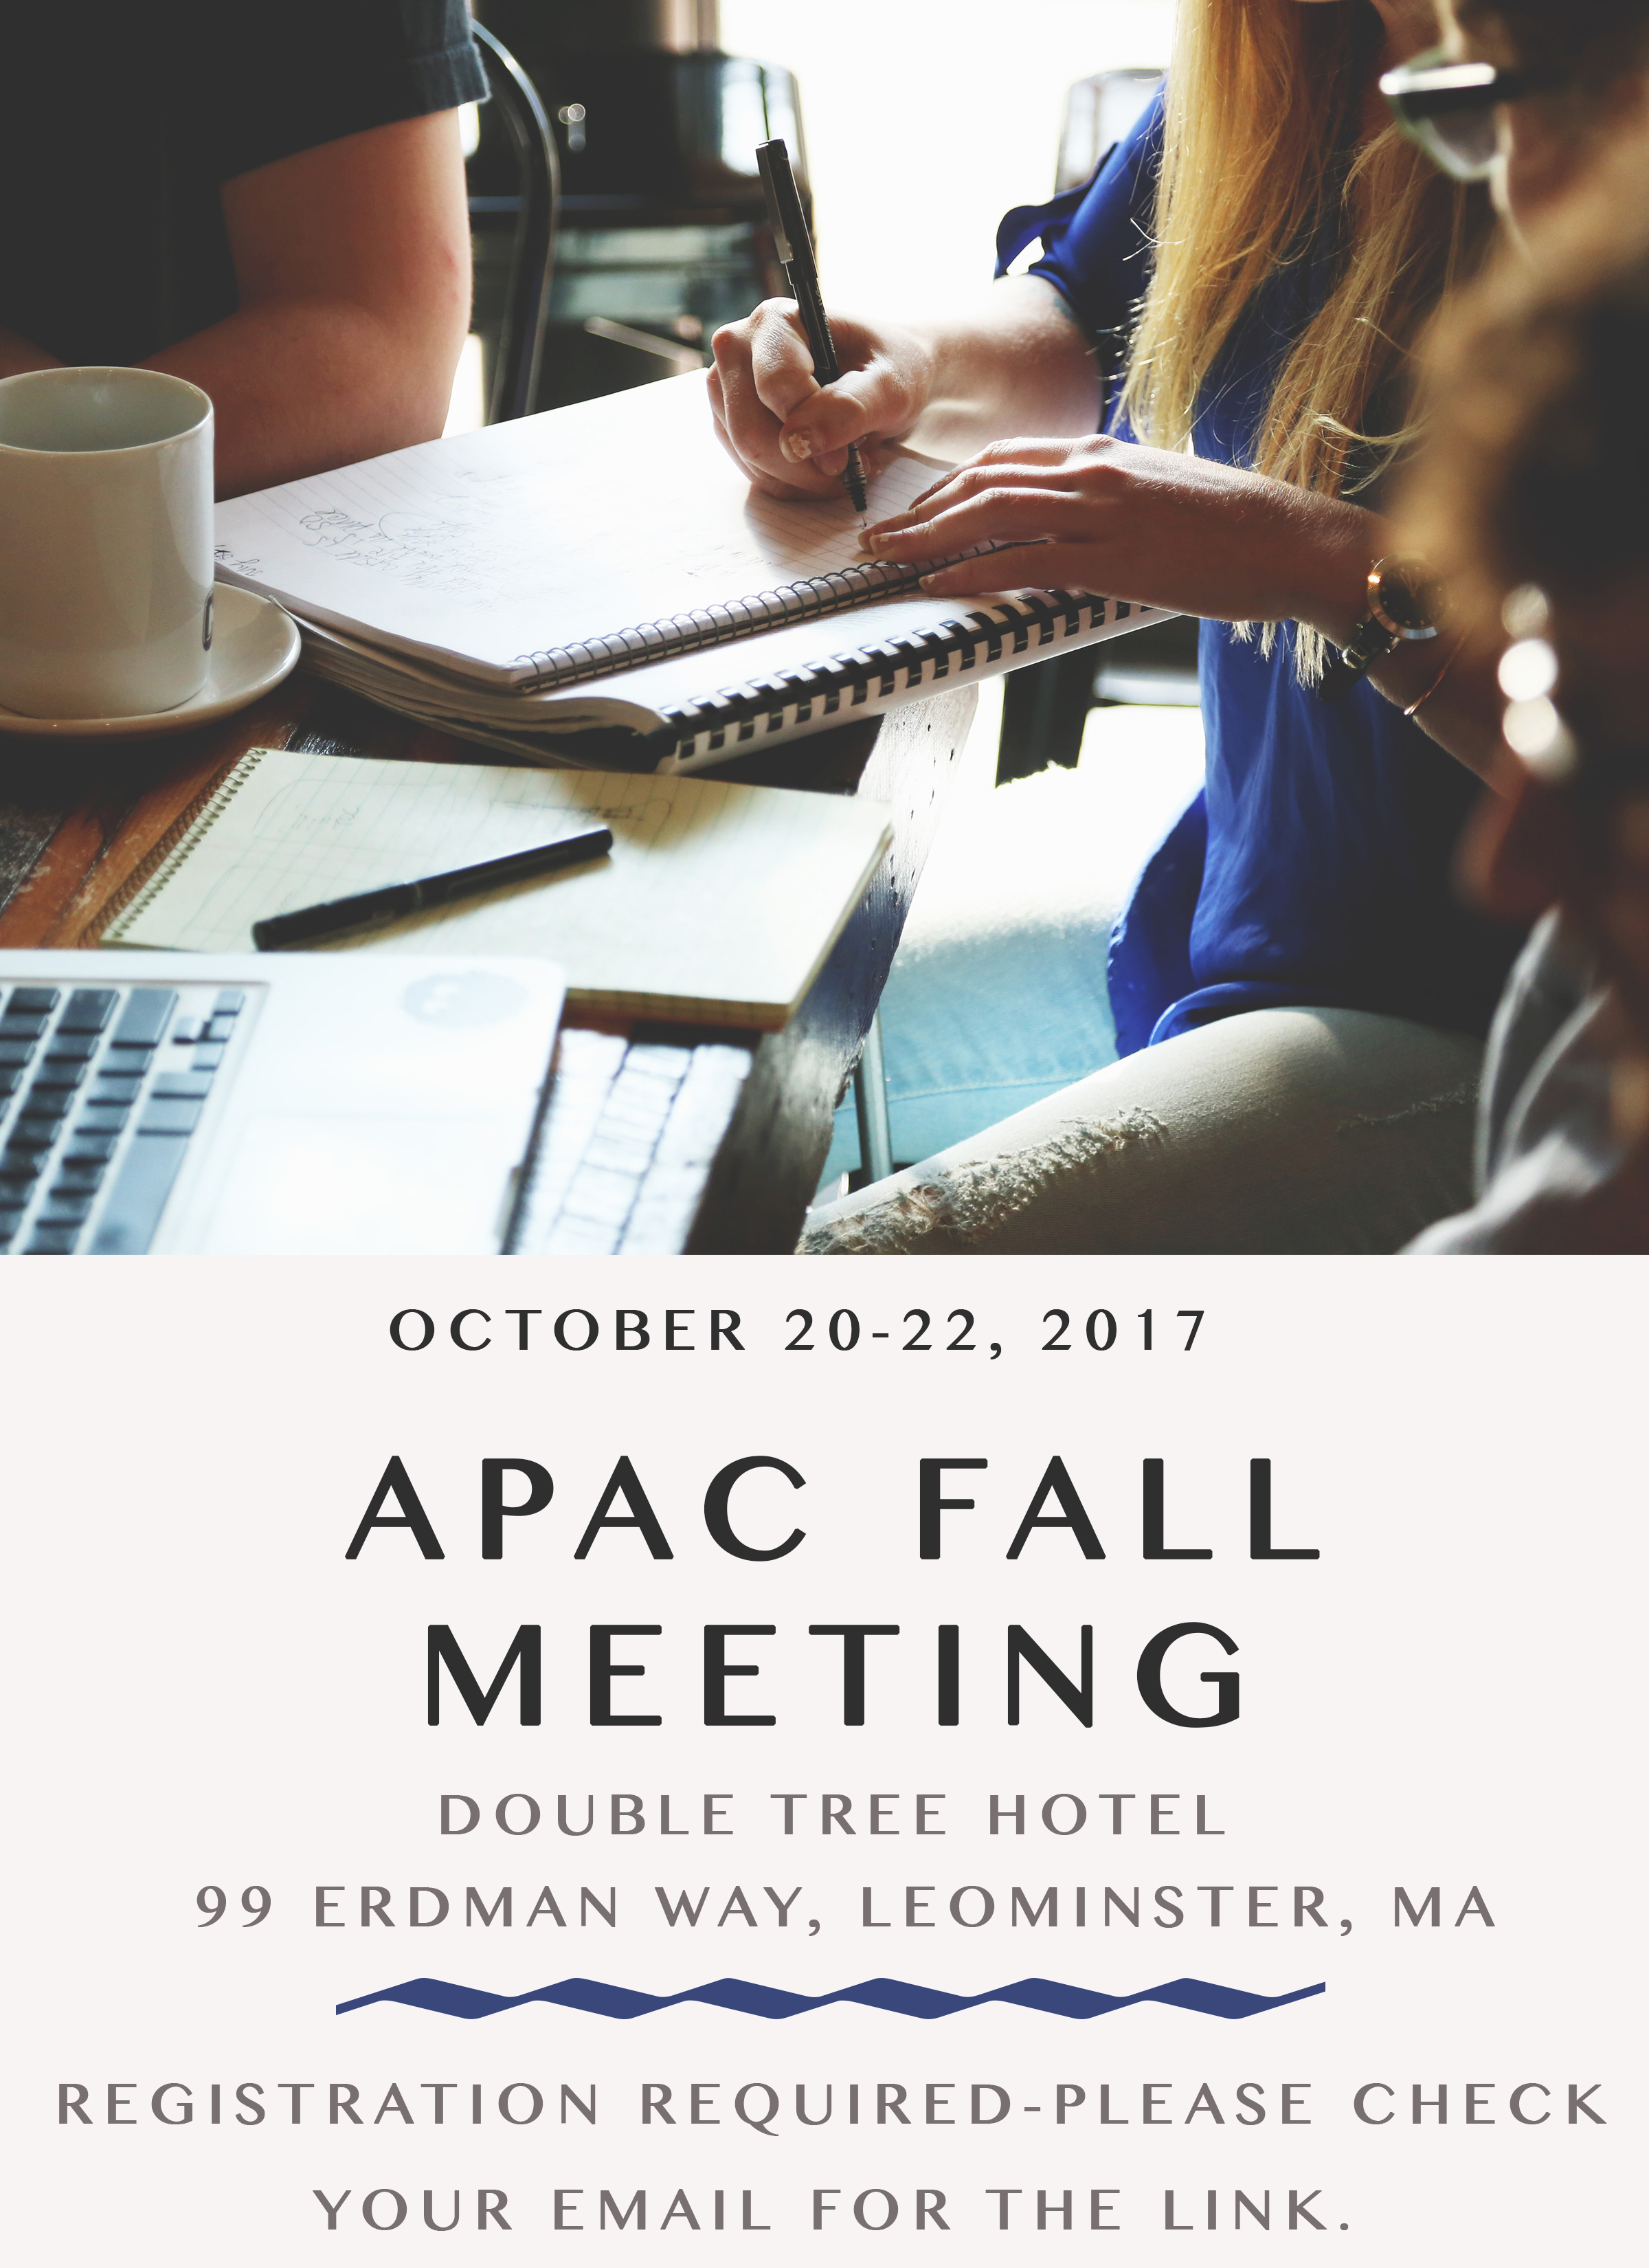 APAC Fall Meeting